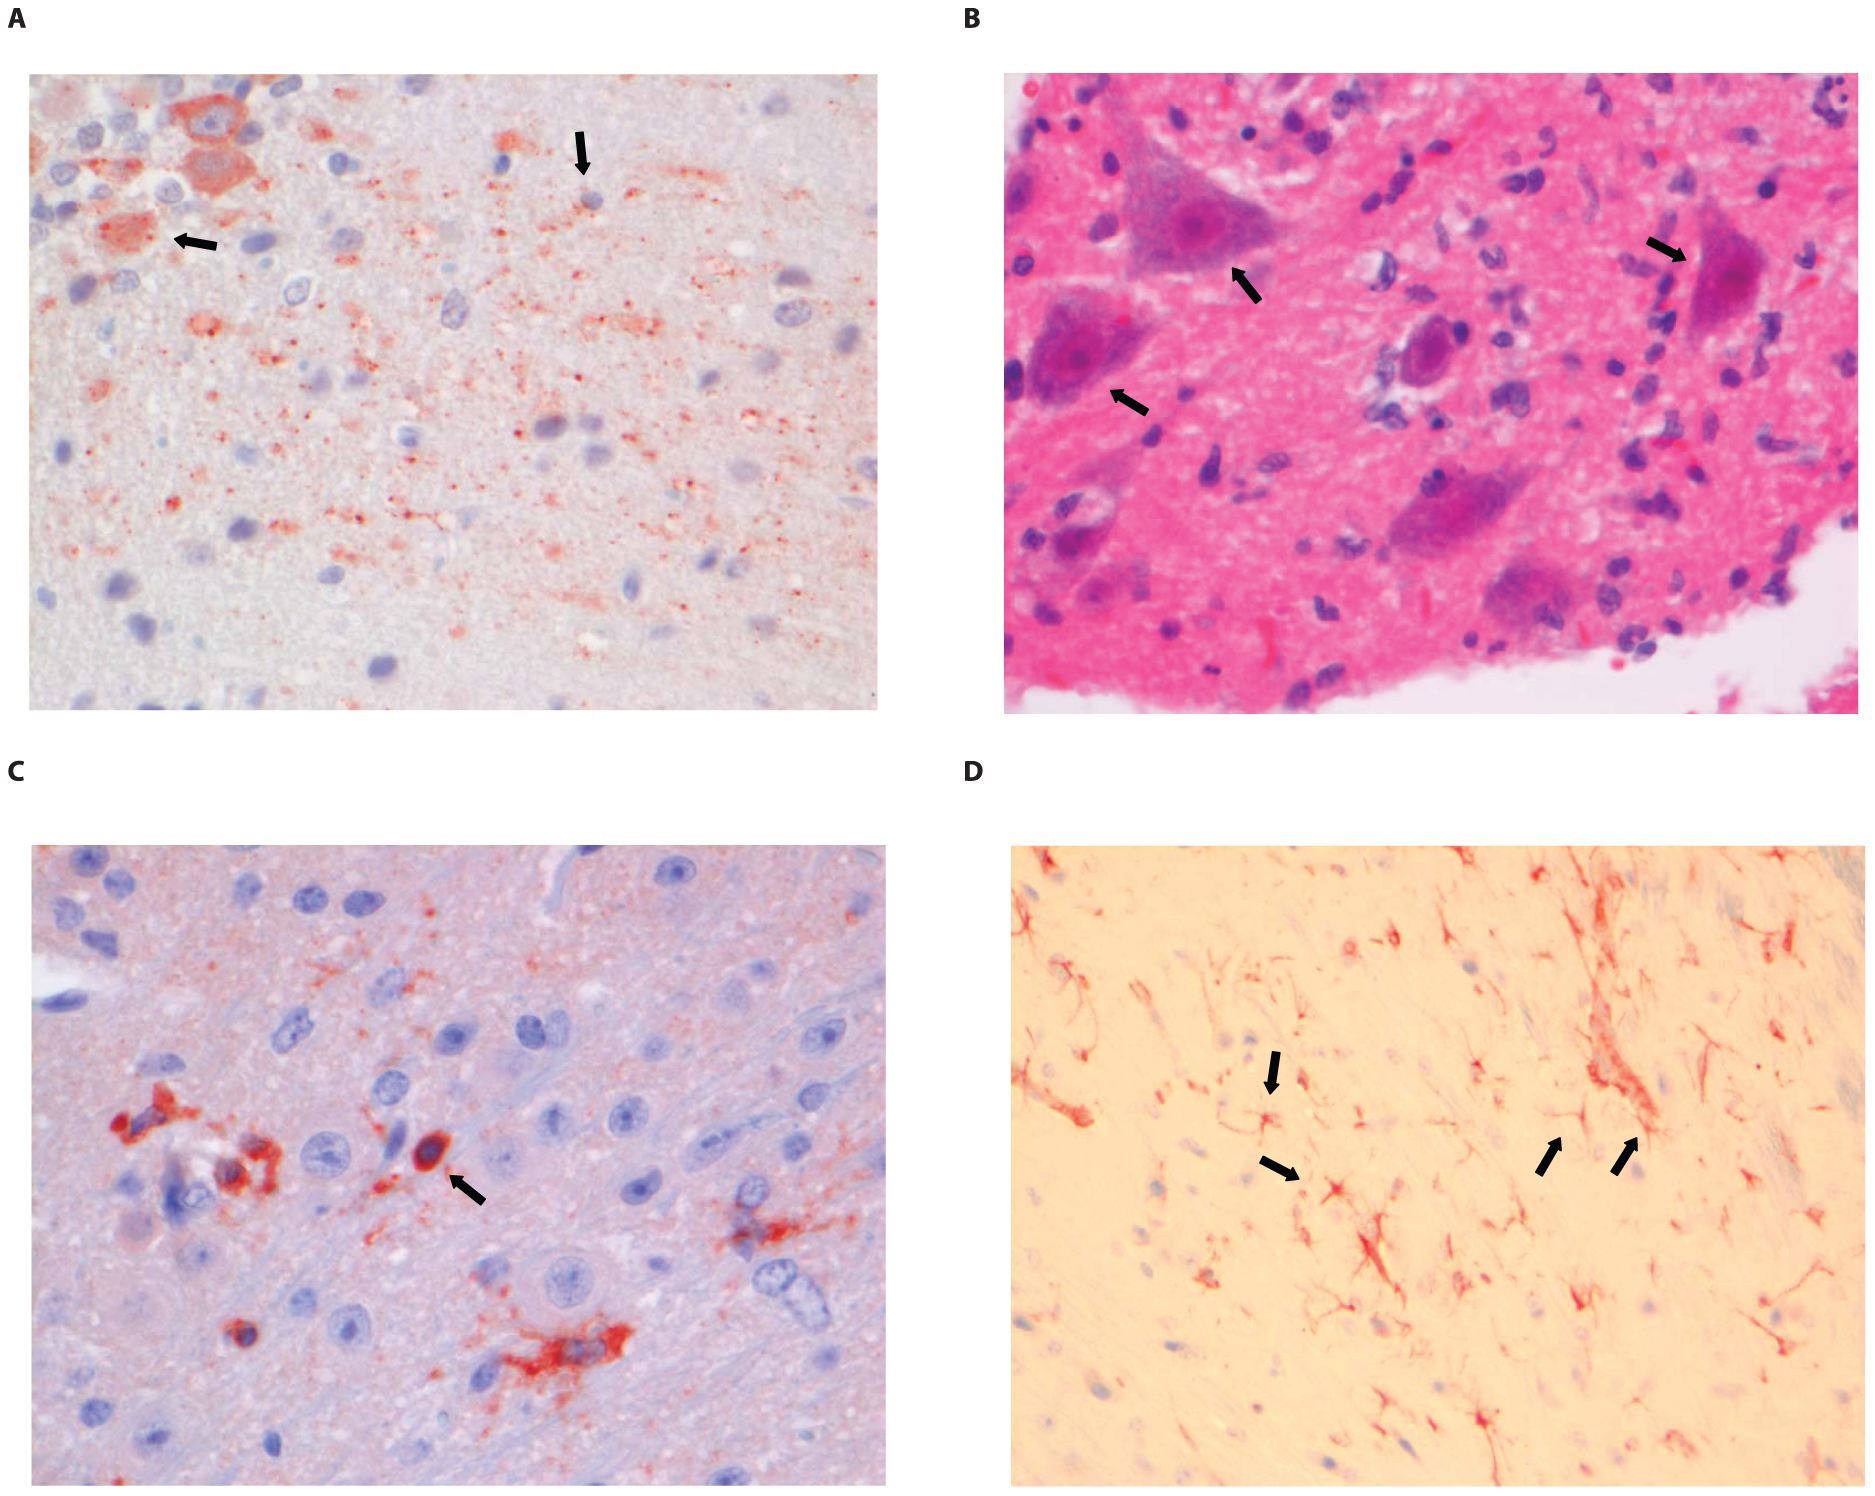 Histopathology of 8-week old BALB/c mice infected i.m. with 10<sup>6</sup> TCID<sub>50</sub> of SHBRV-18.